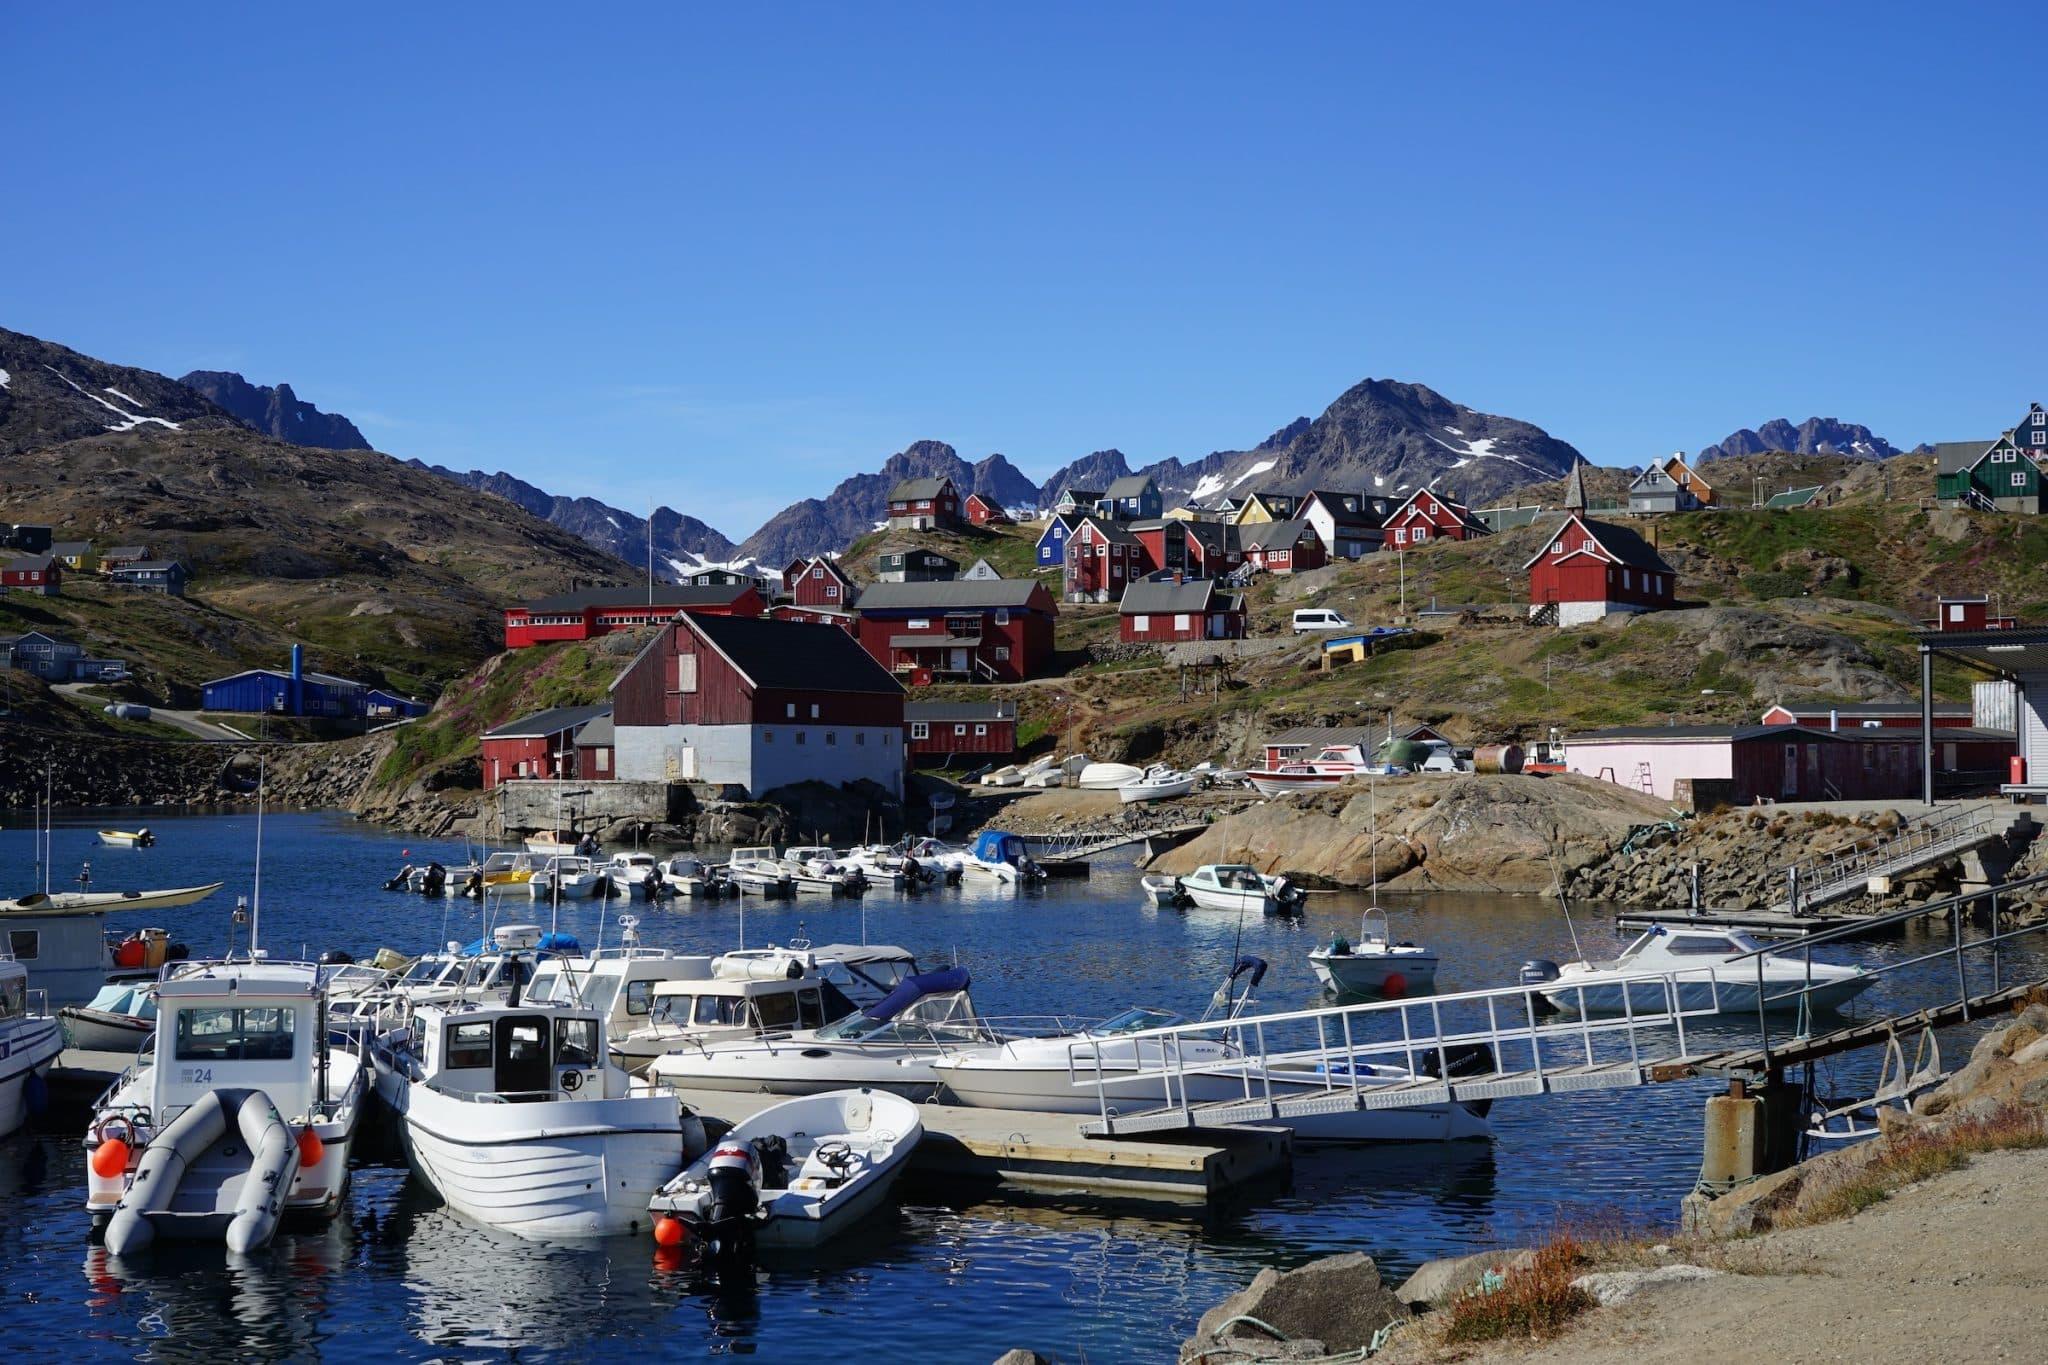 Greenland harbor